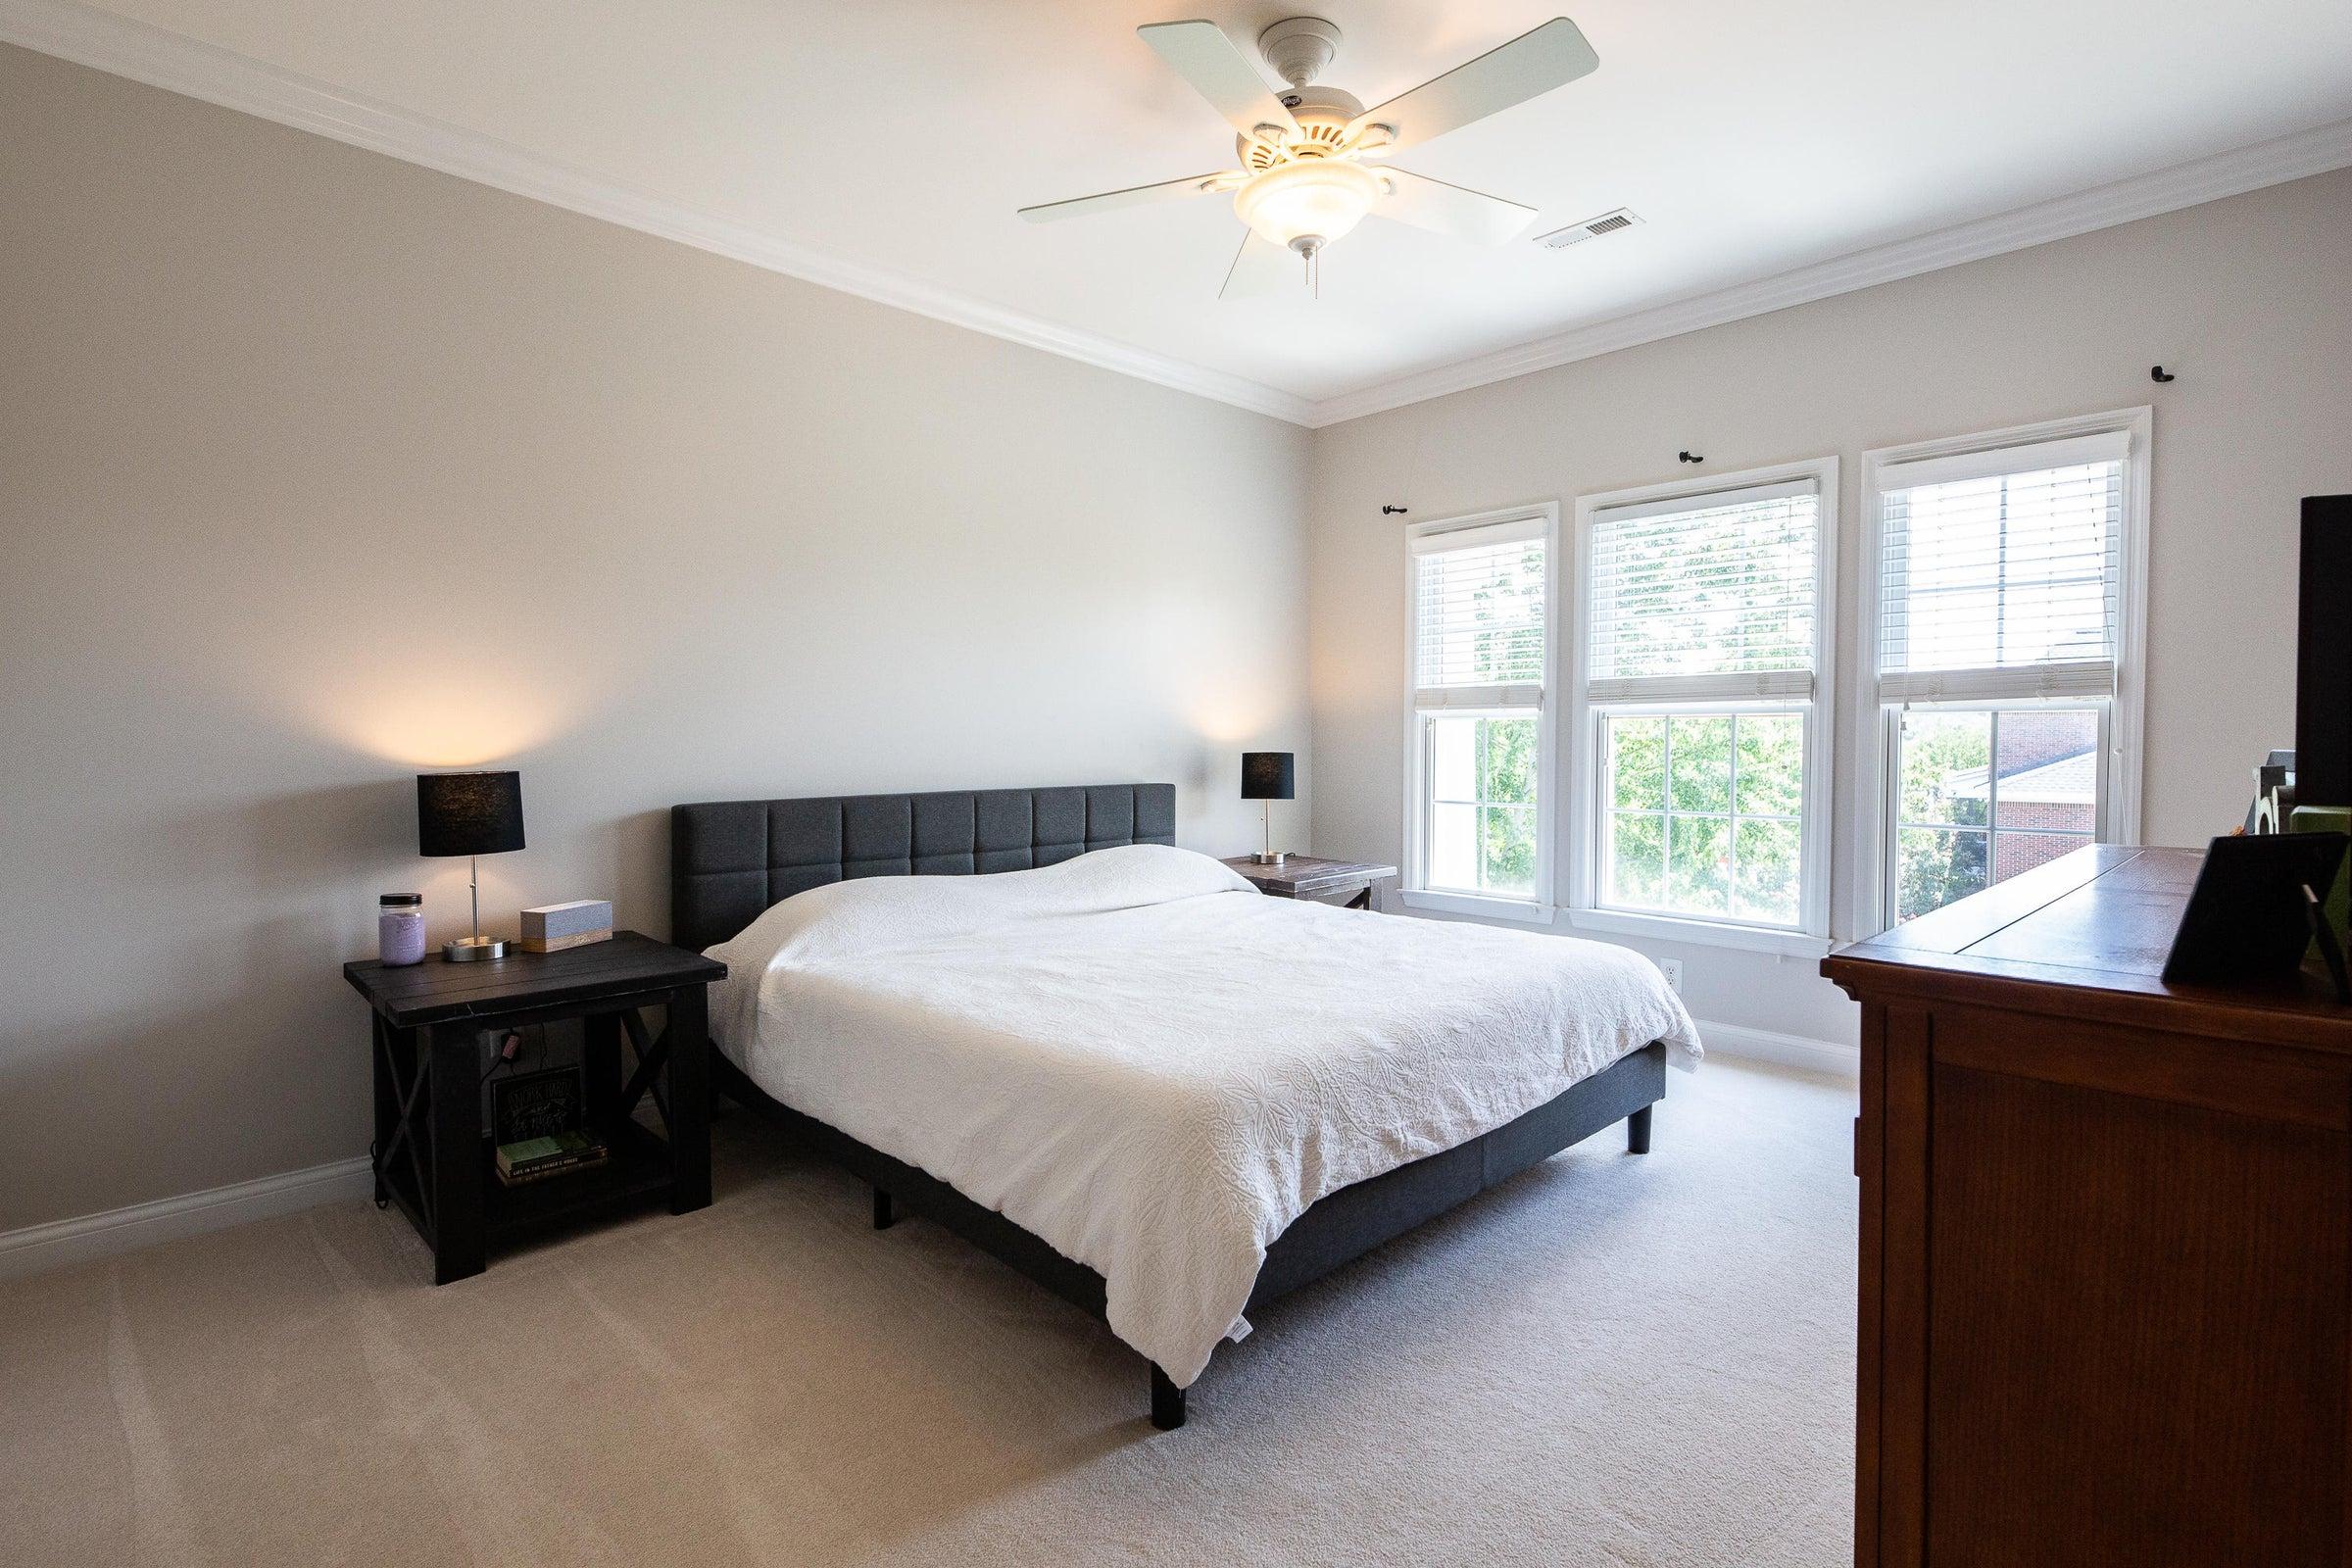 Bedroom 4 with Ensuite Bath